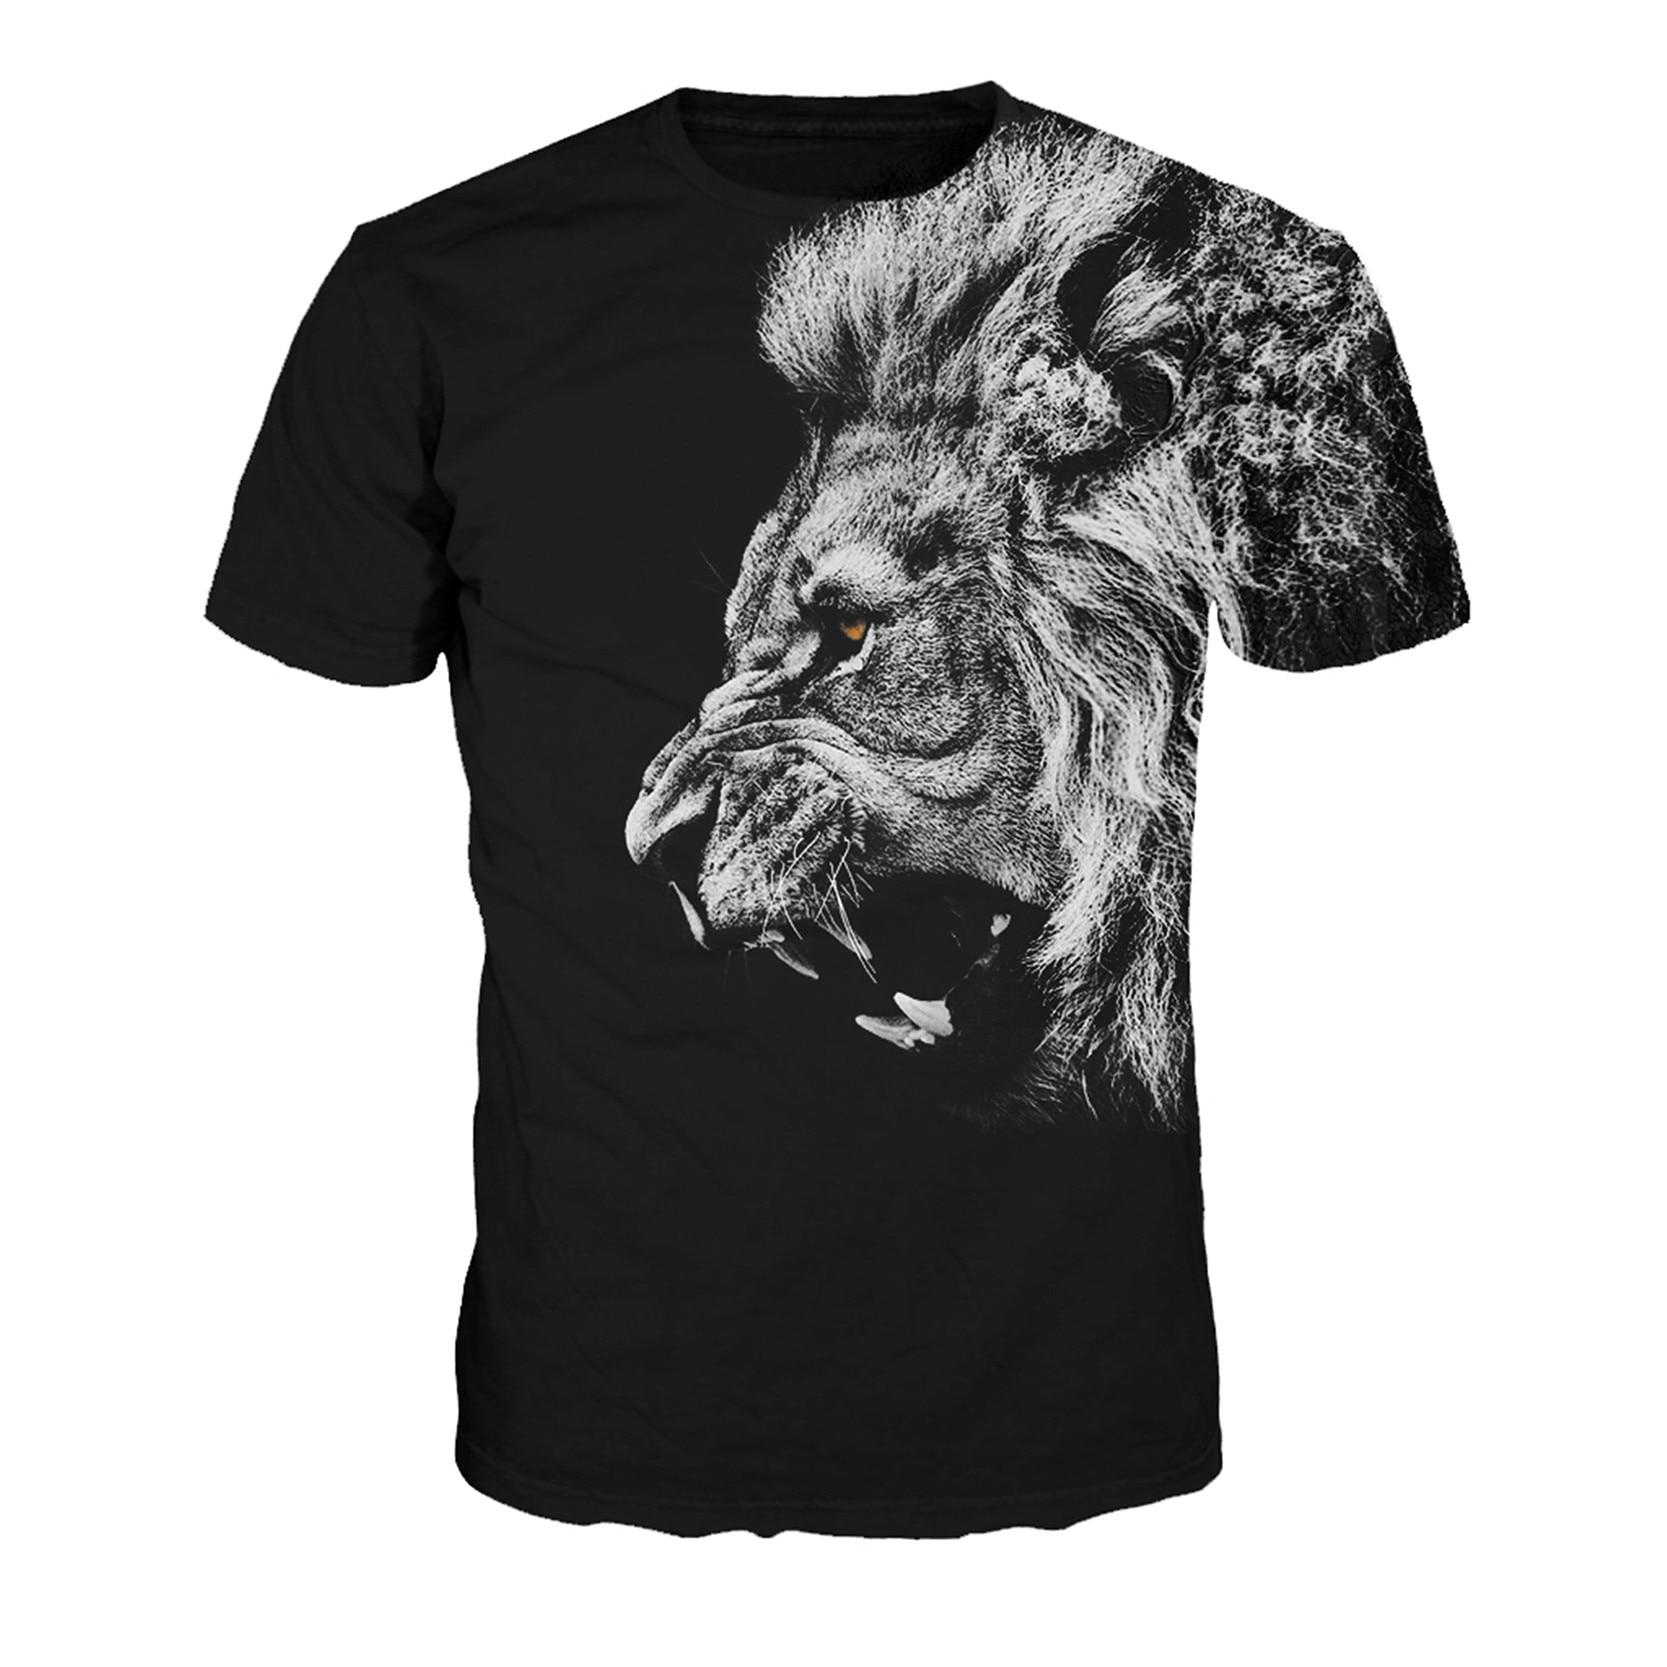 Free Shipping Cool Lion T Shirt Black T Shirts Men Hip Hop Tshirt O Neck Women